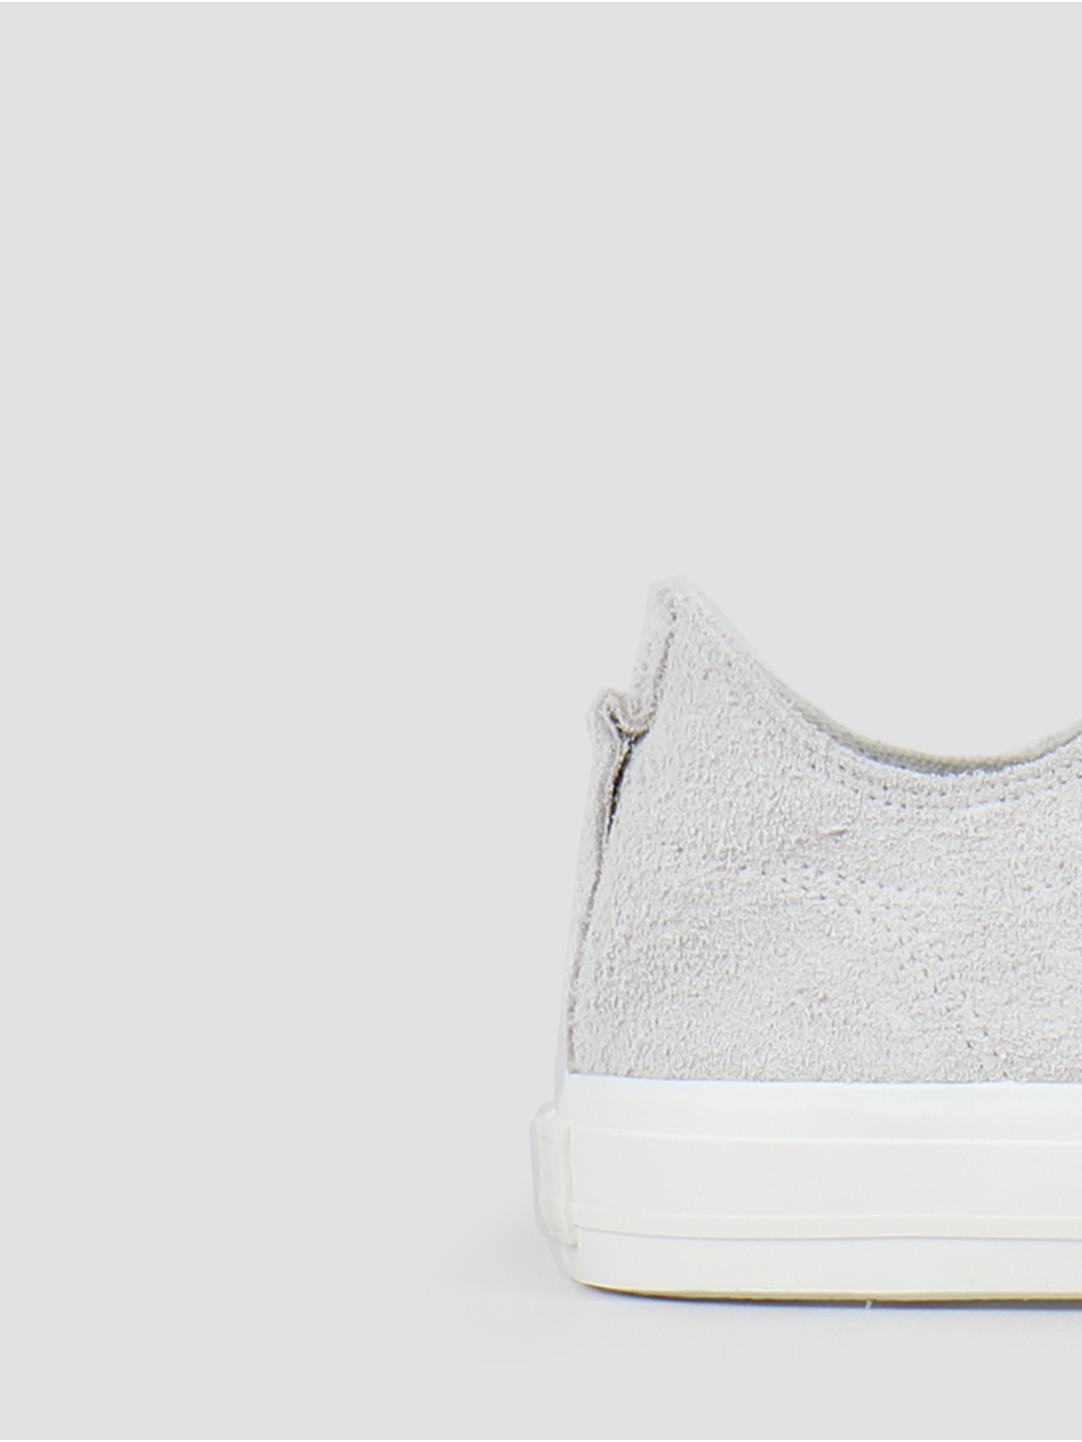 adidas adidas Nizza Rf Rawwht Rawwht Owhite EE5609